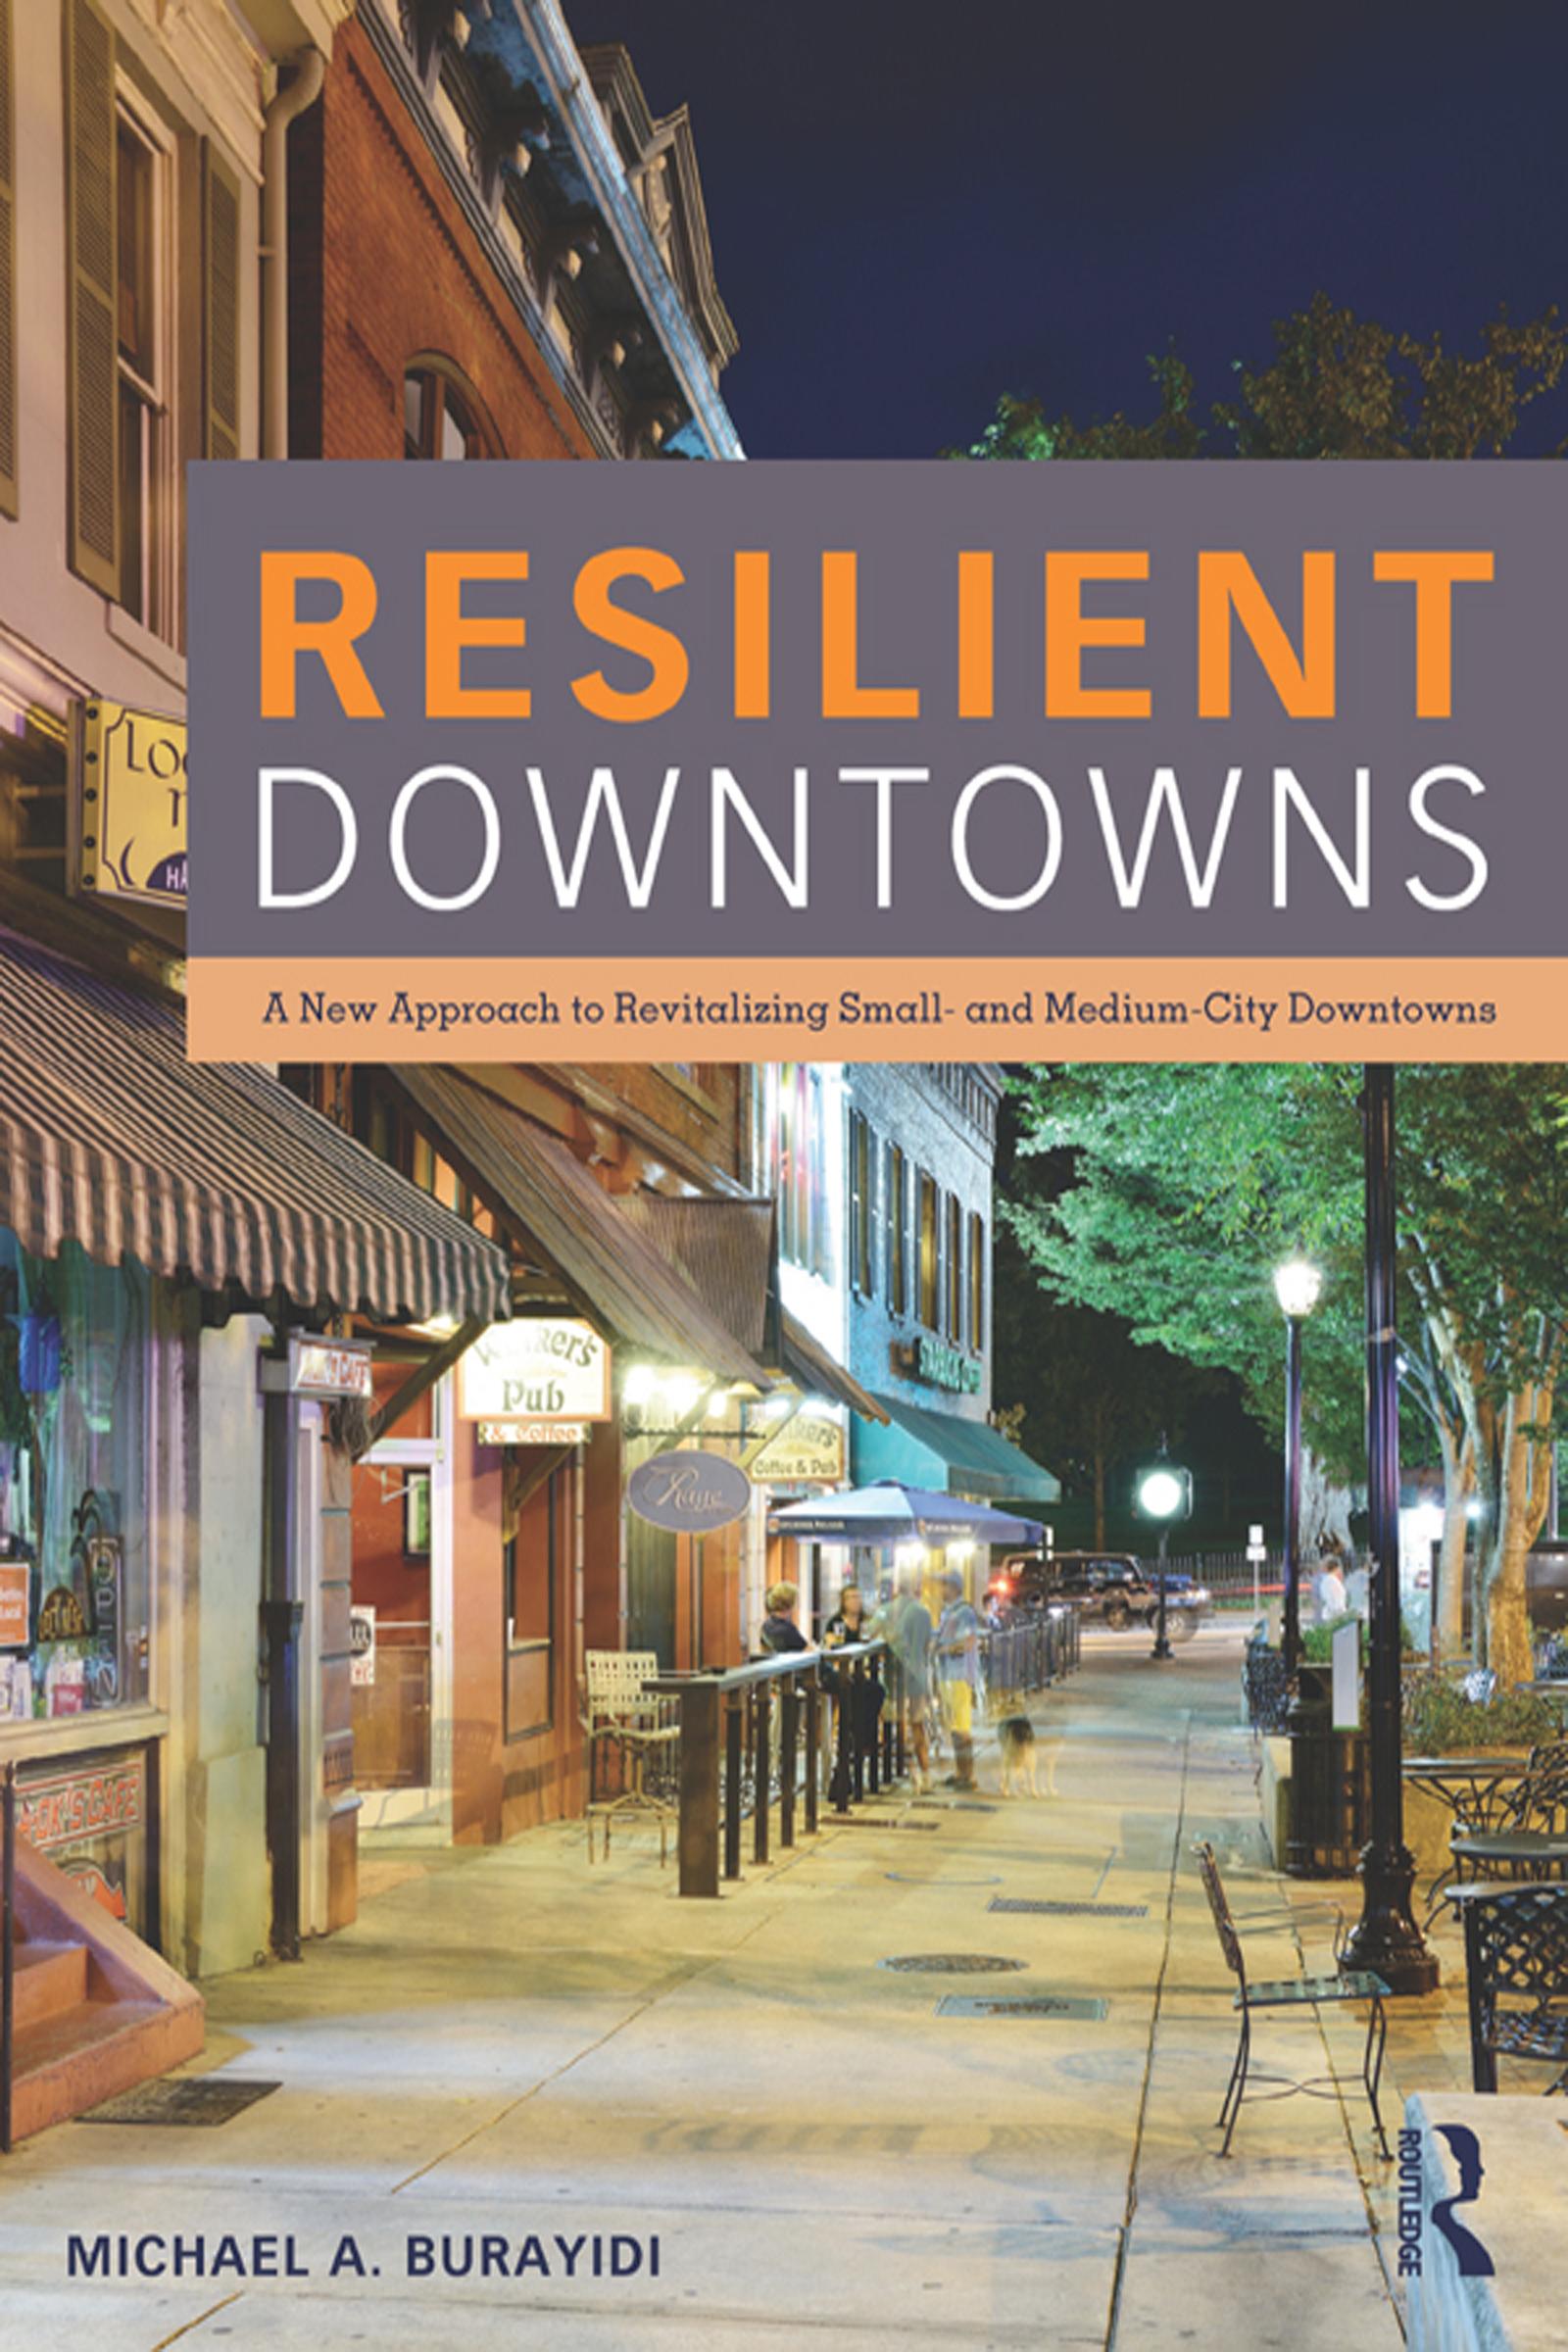 Economic Distress and Downtown Revitalization